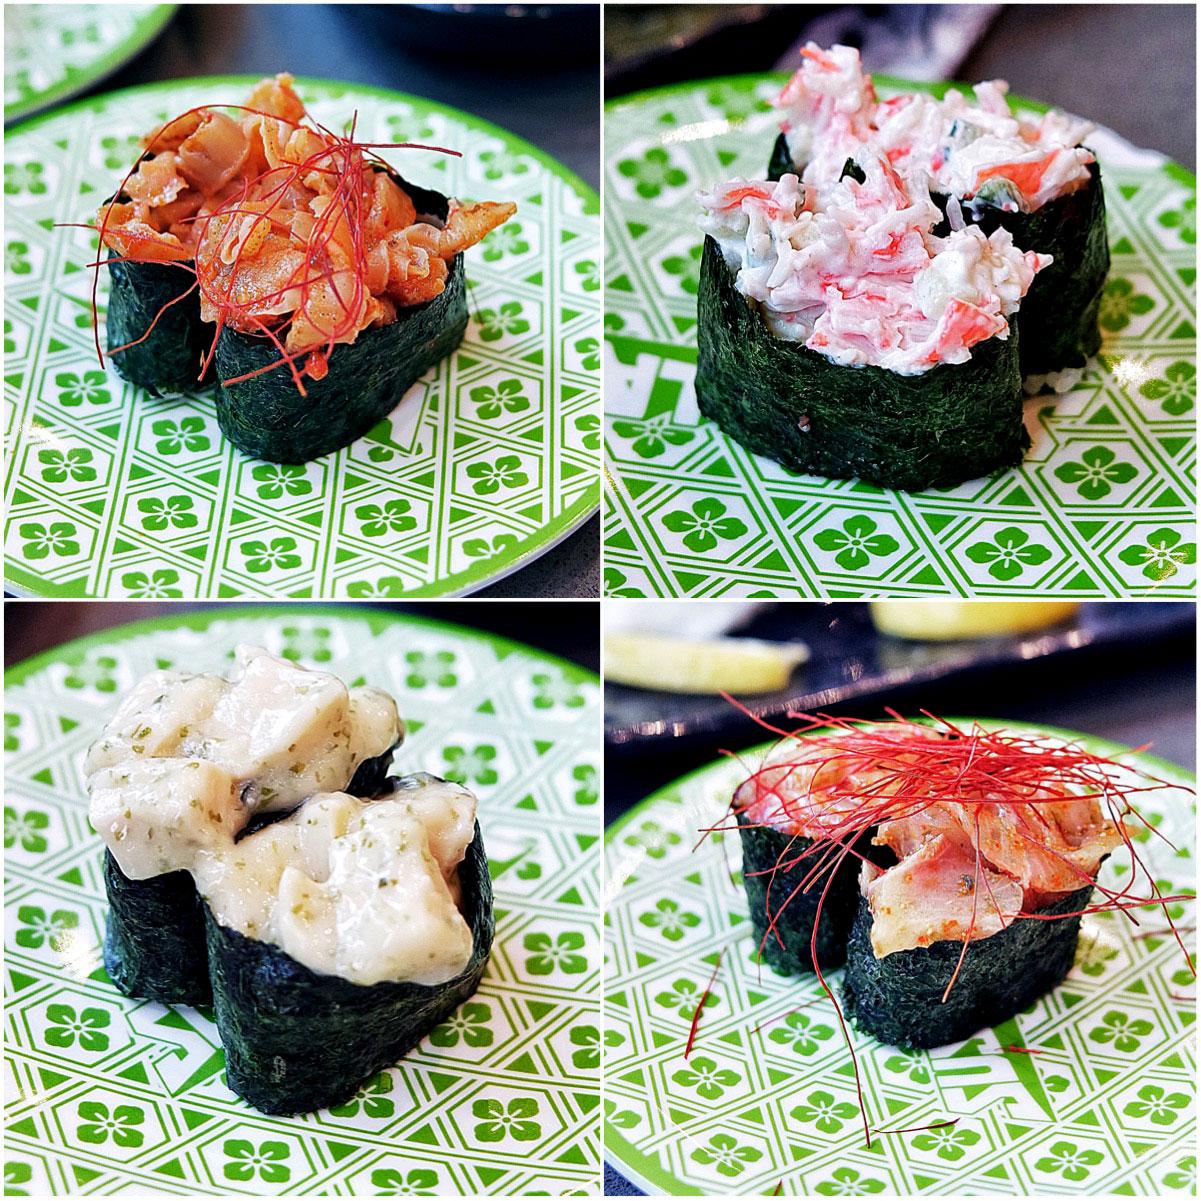 Sushi train order